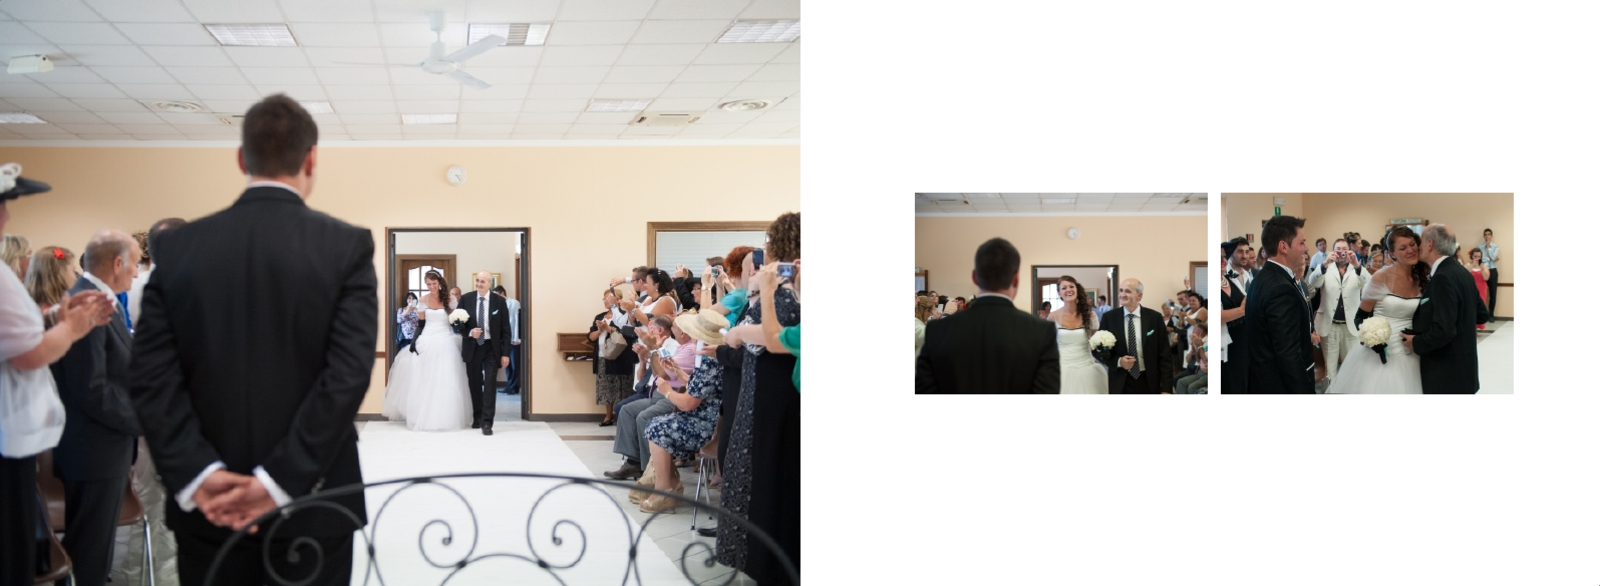 Auguri Matrimonio Testimoni Di Geova : Matrimonio testimoni geova alessandria